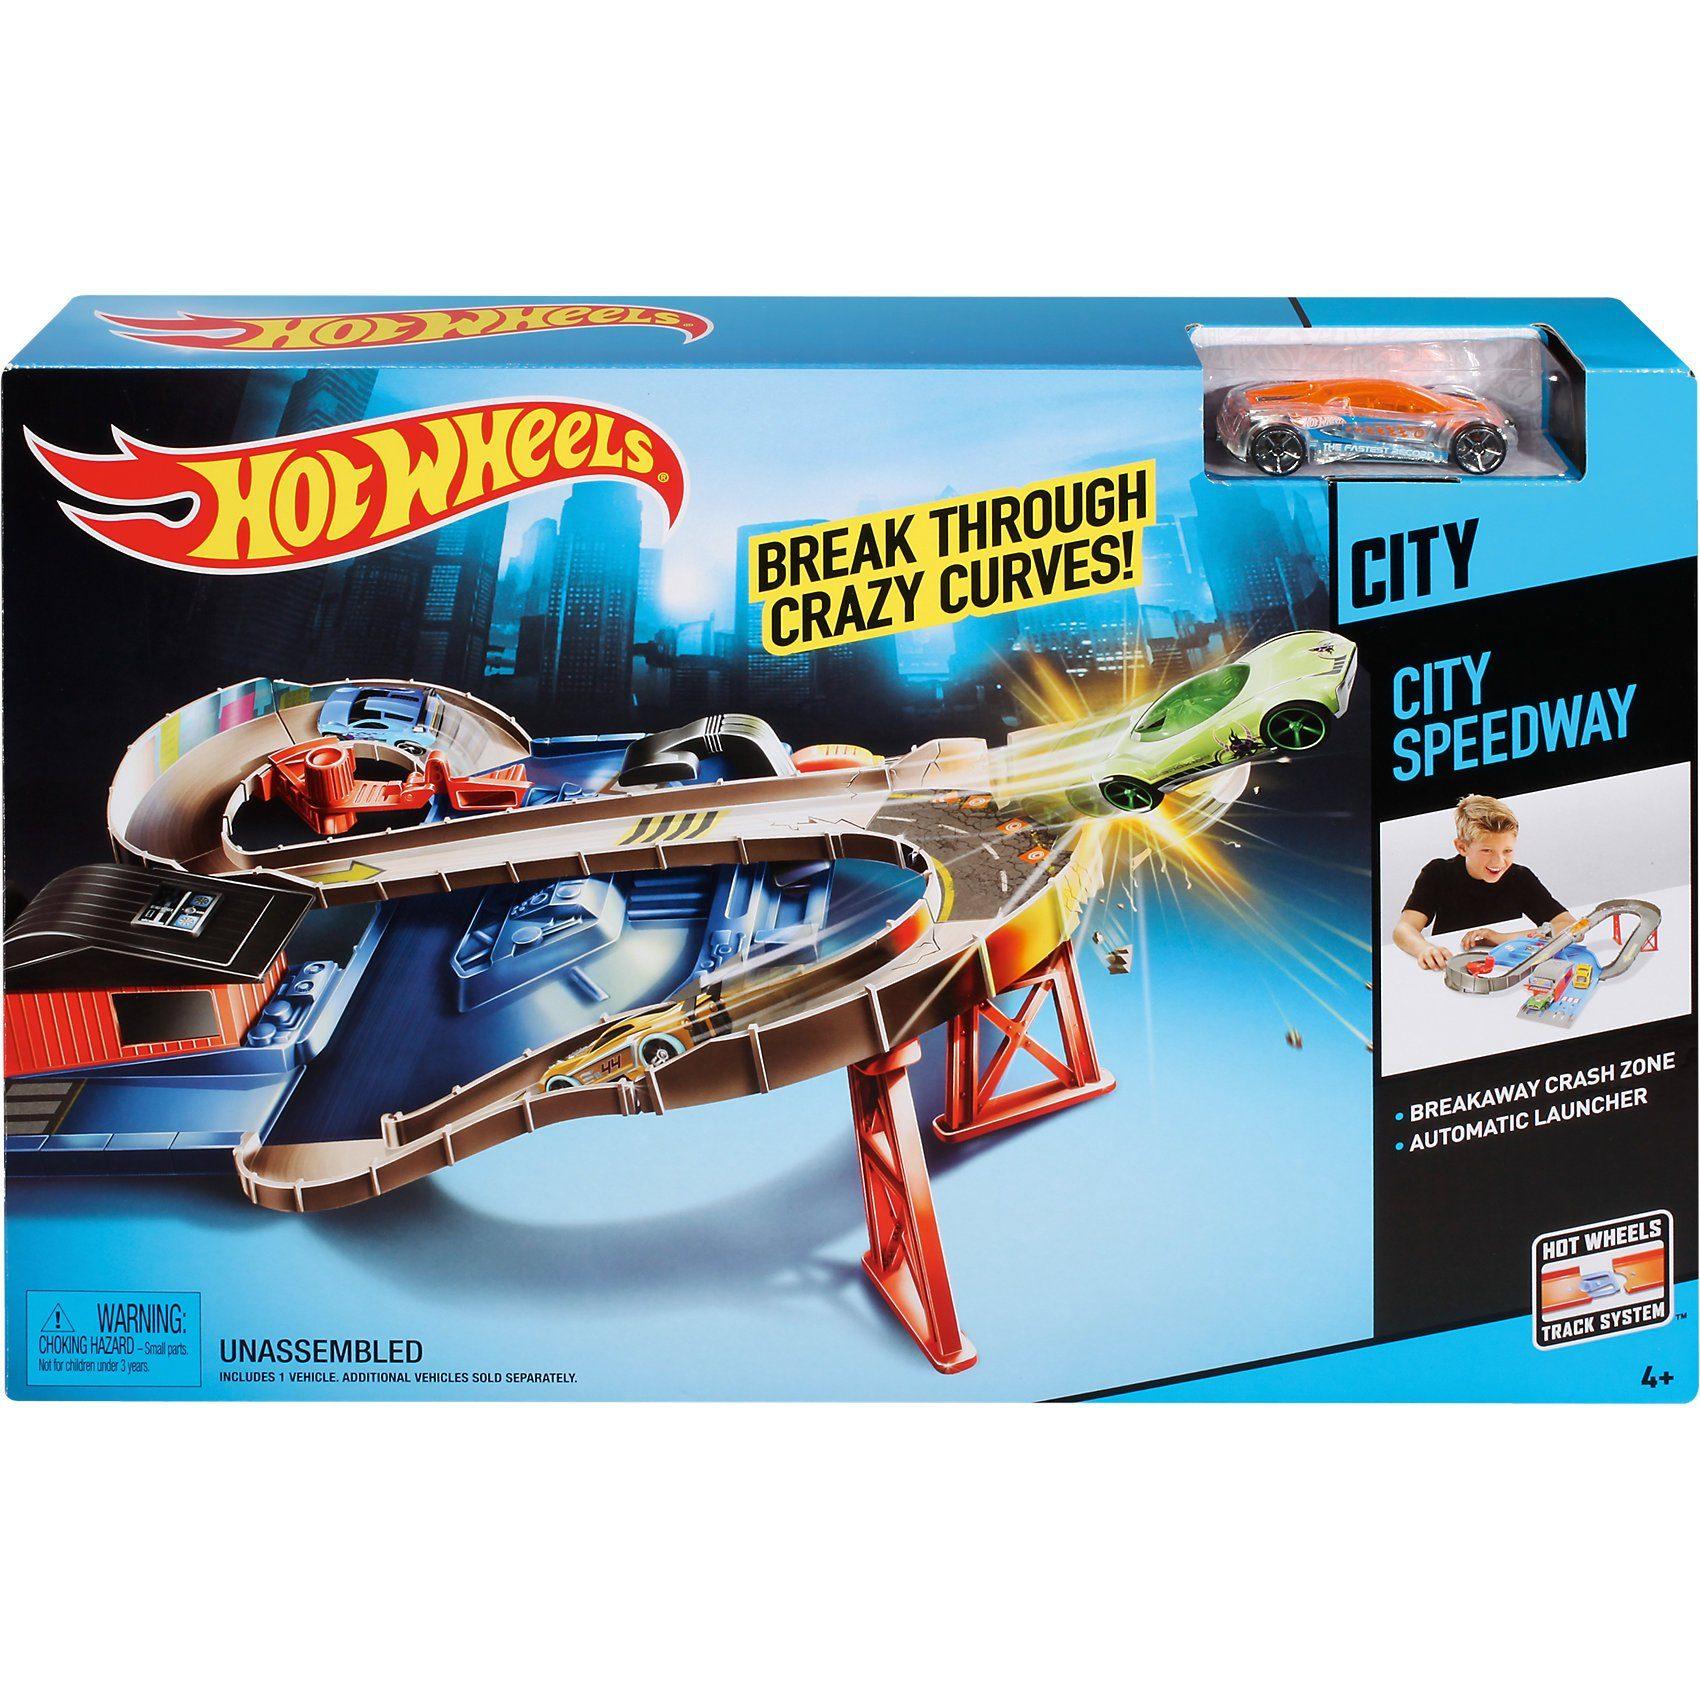 Mattel Hot Wheels City Speedway